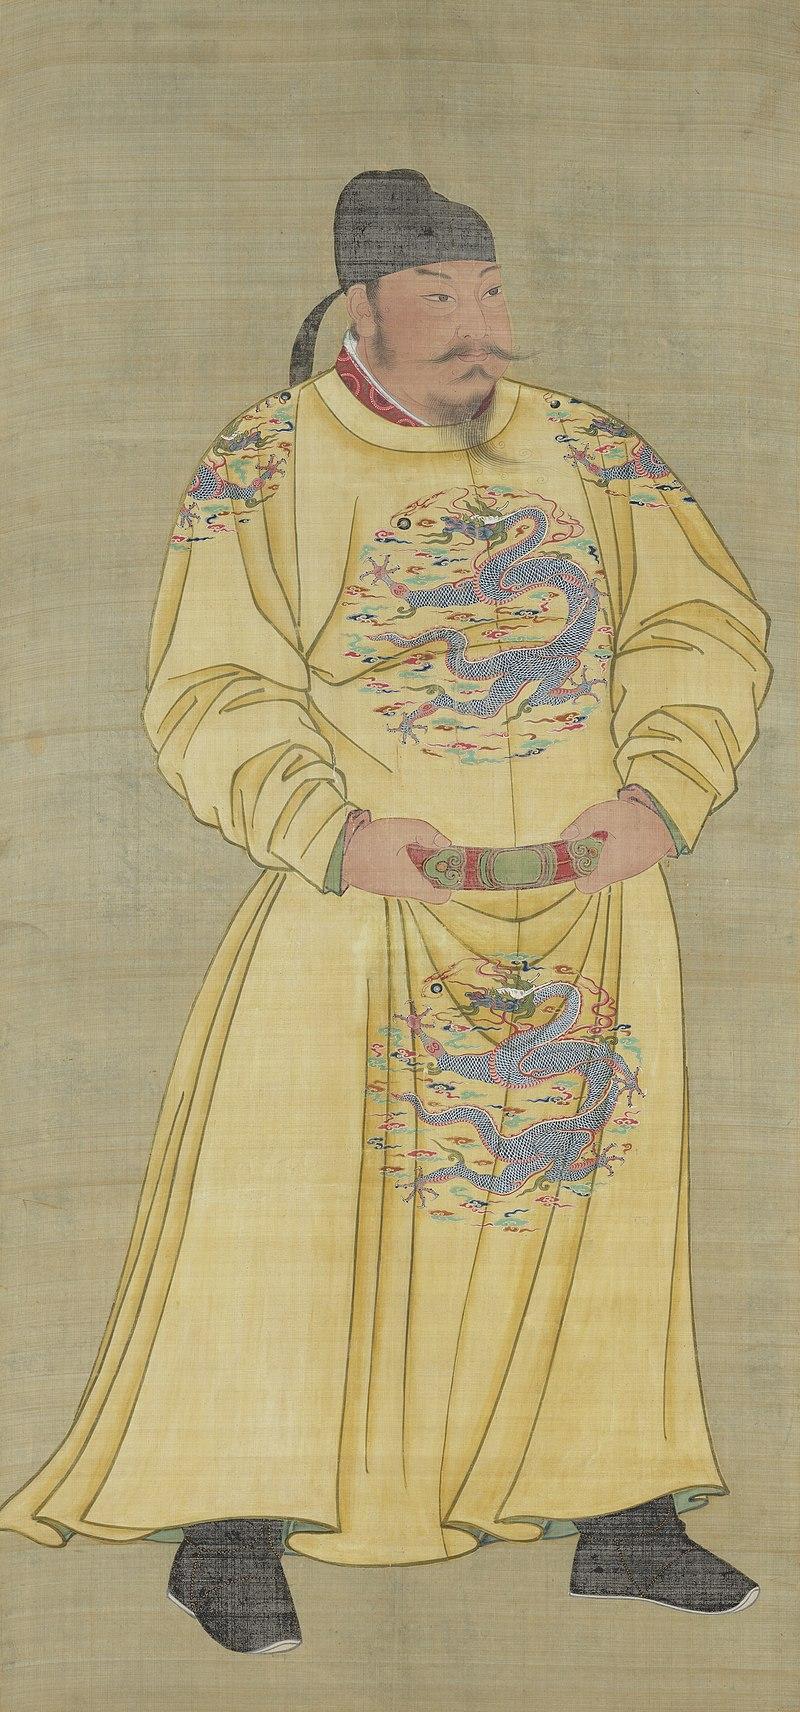 Emperor Taizong of the Tang Dynasty. (Image: wikimedia / CC0 1.0)